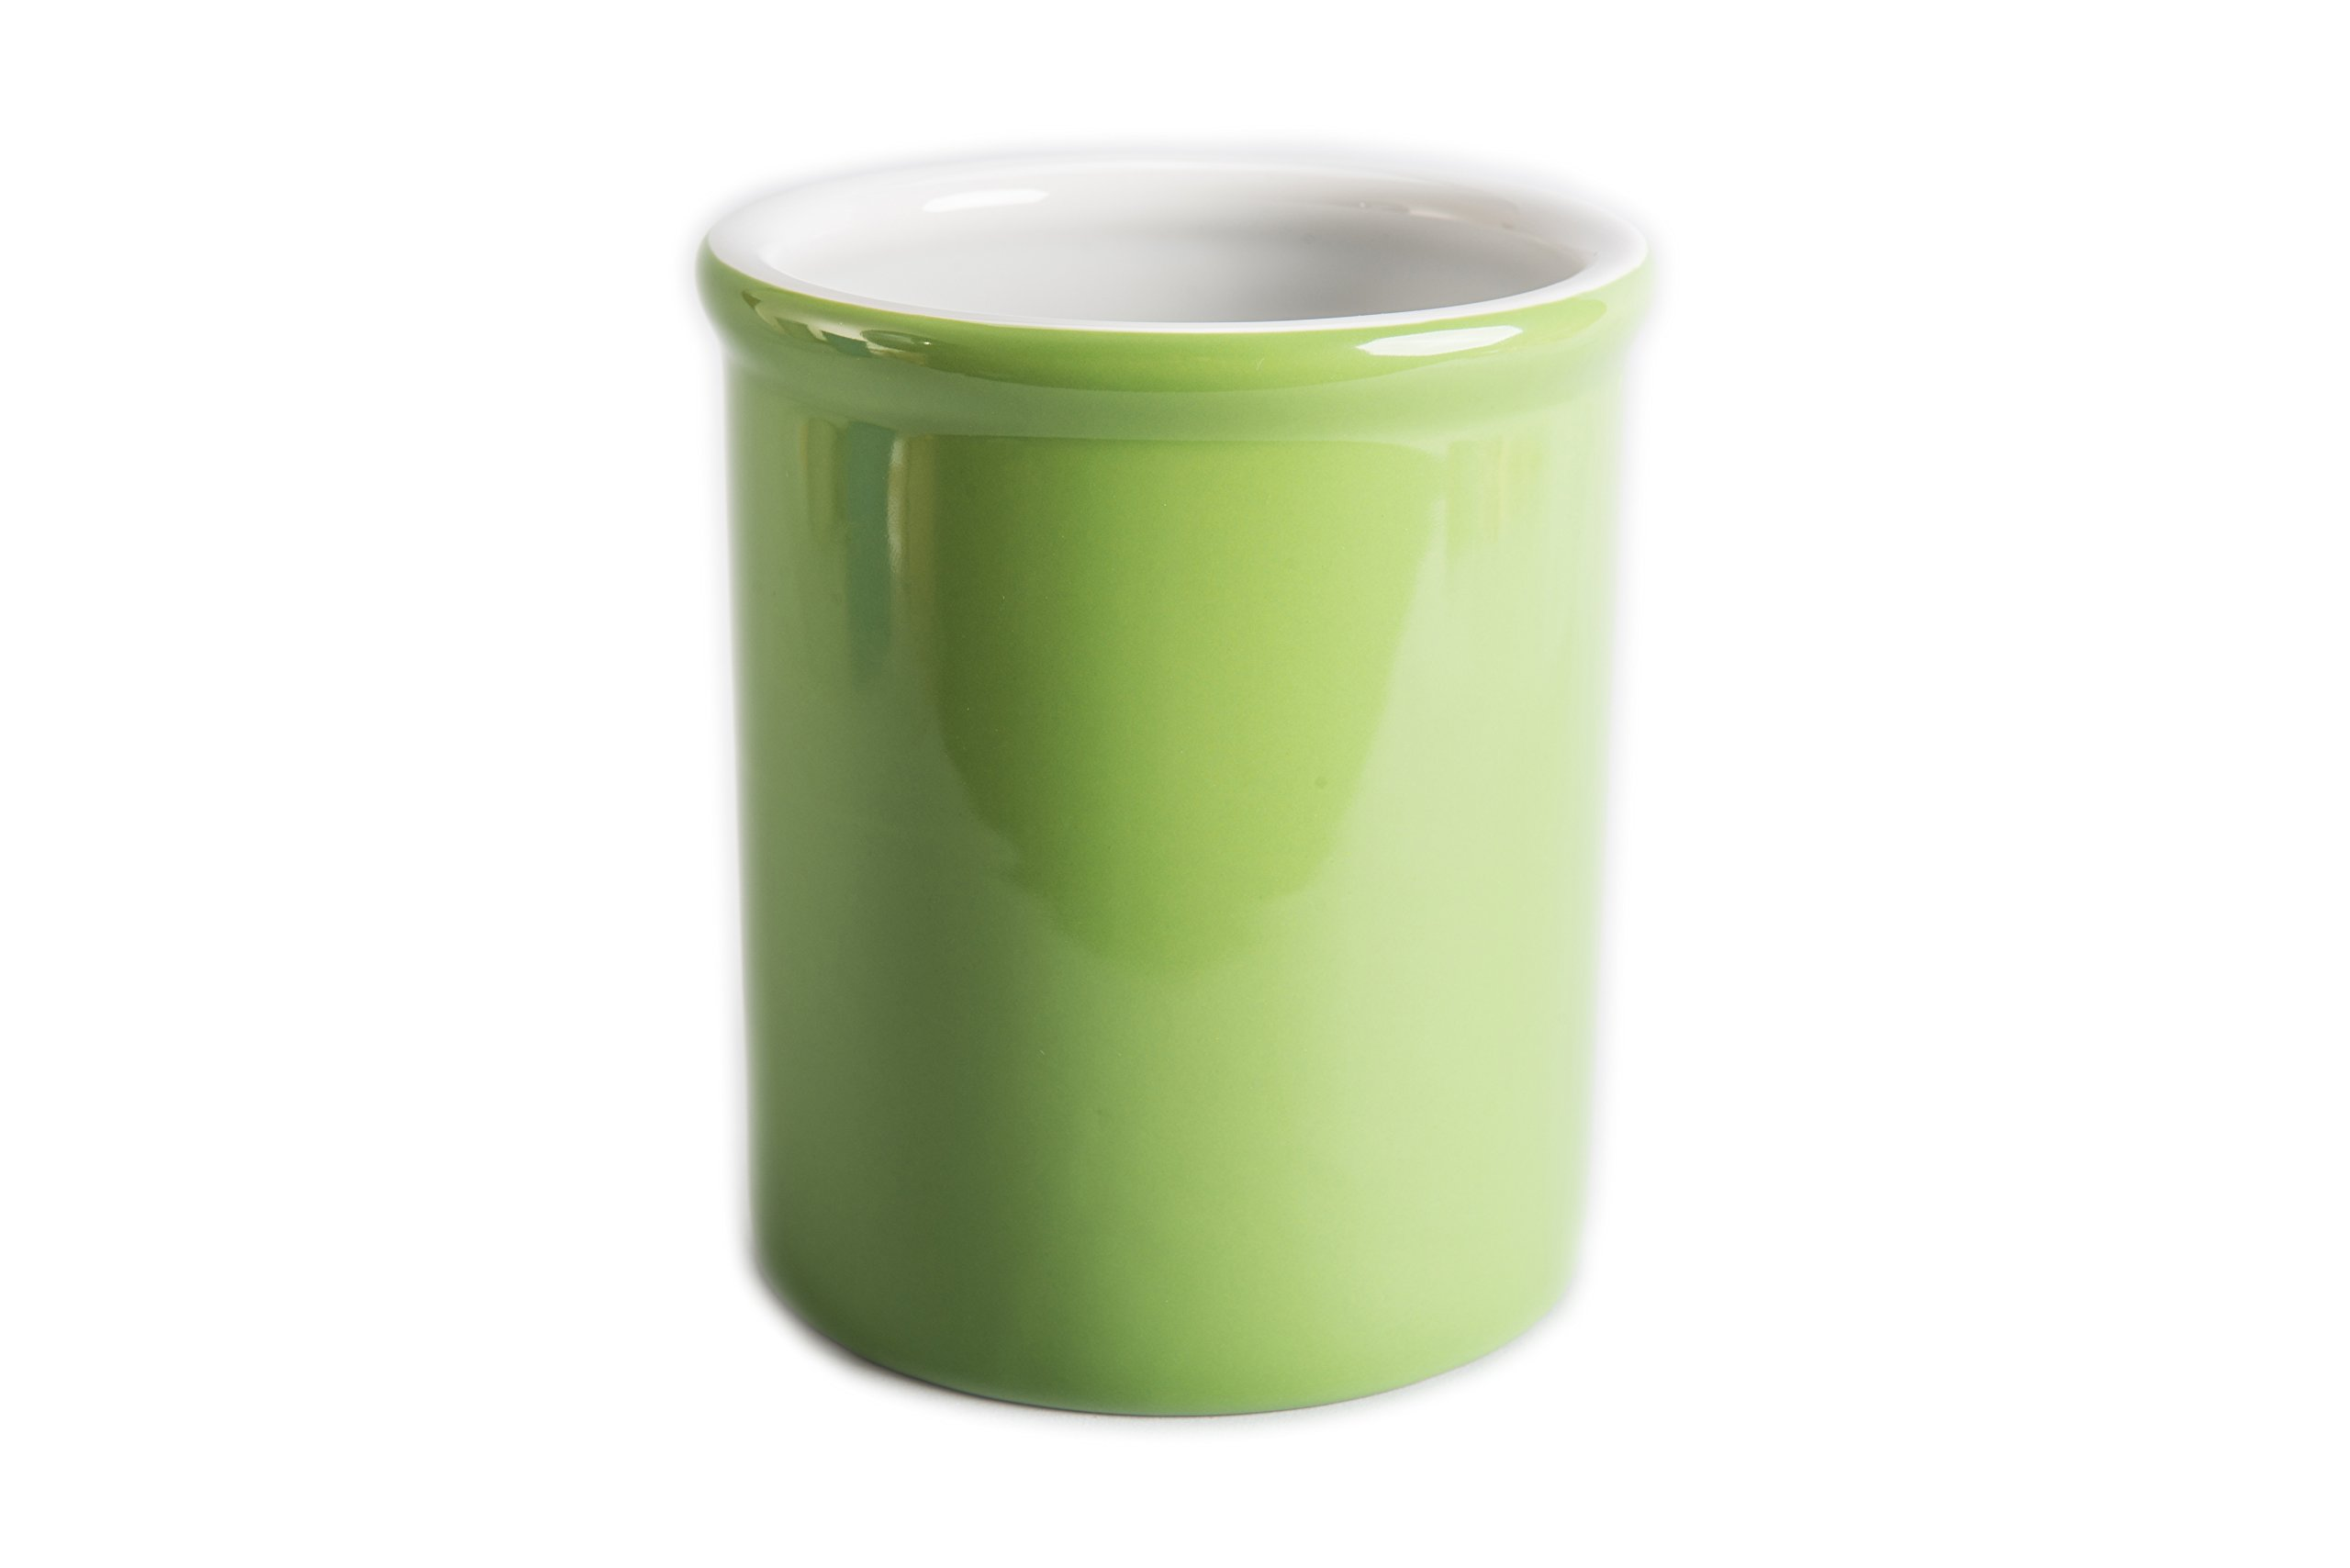 BIA Cordon Bleu Seasons 6.5-Inch Utensil Holder, Grass Green by BIA Cordon Bleu